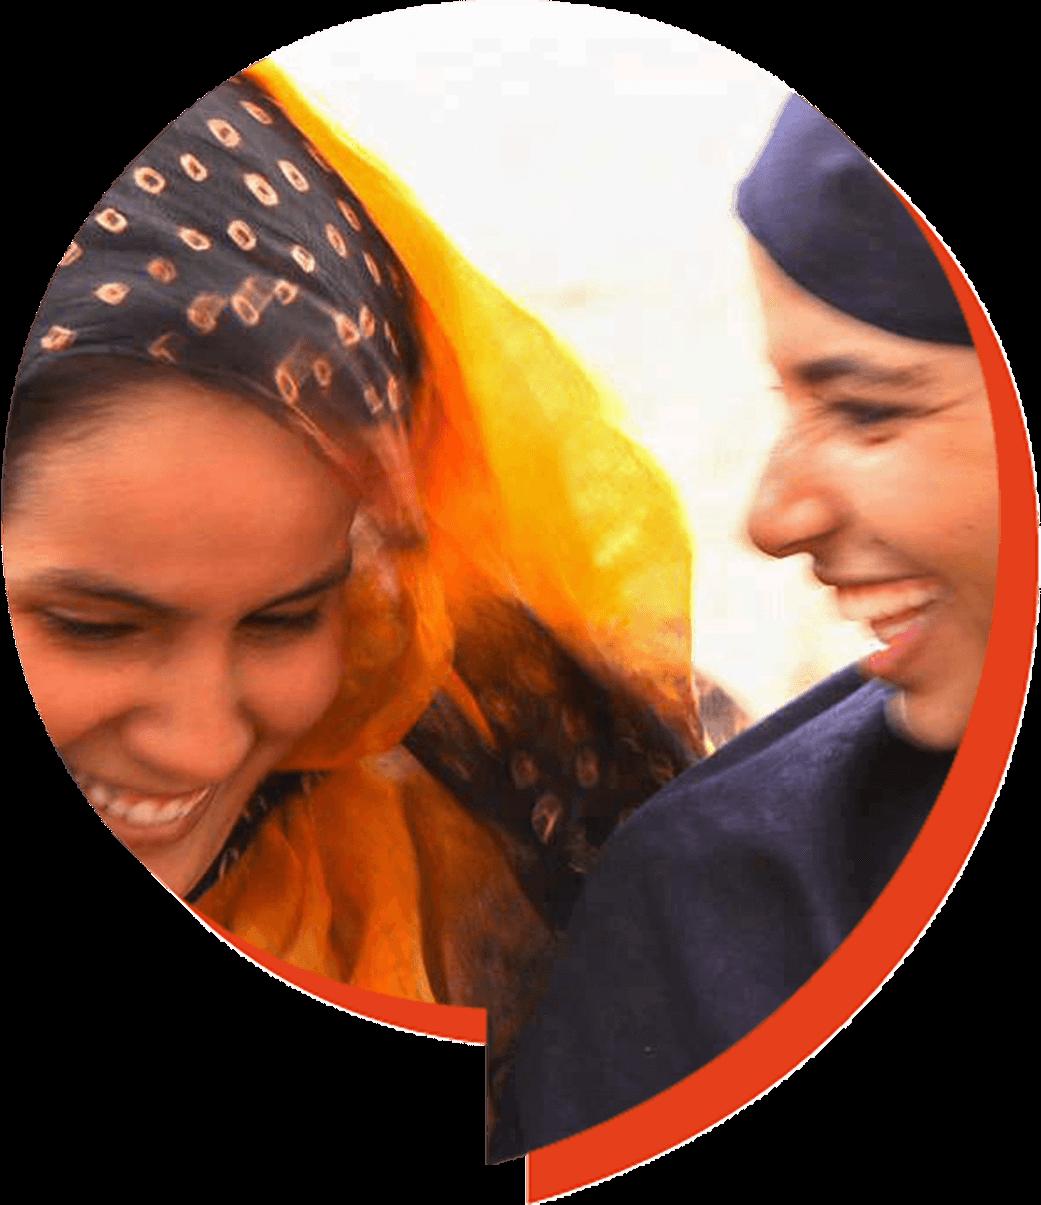 Chicas charlando en Nuakchot, Mauritania